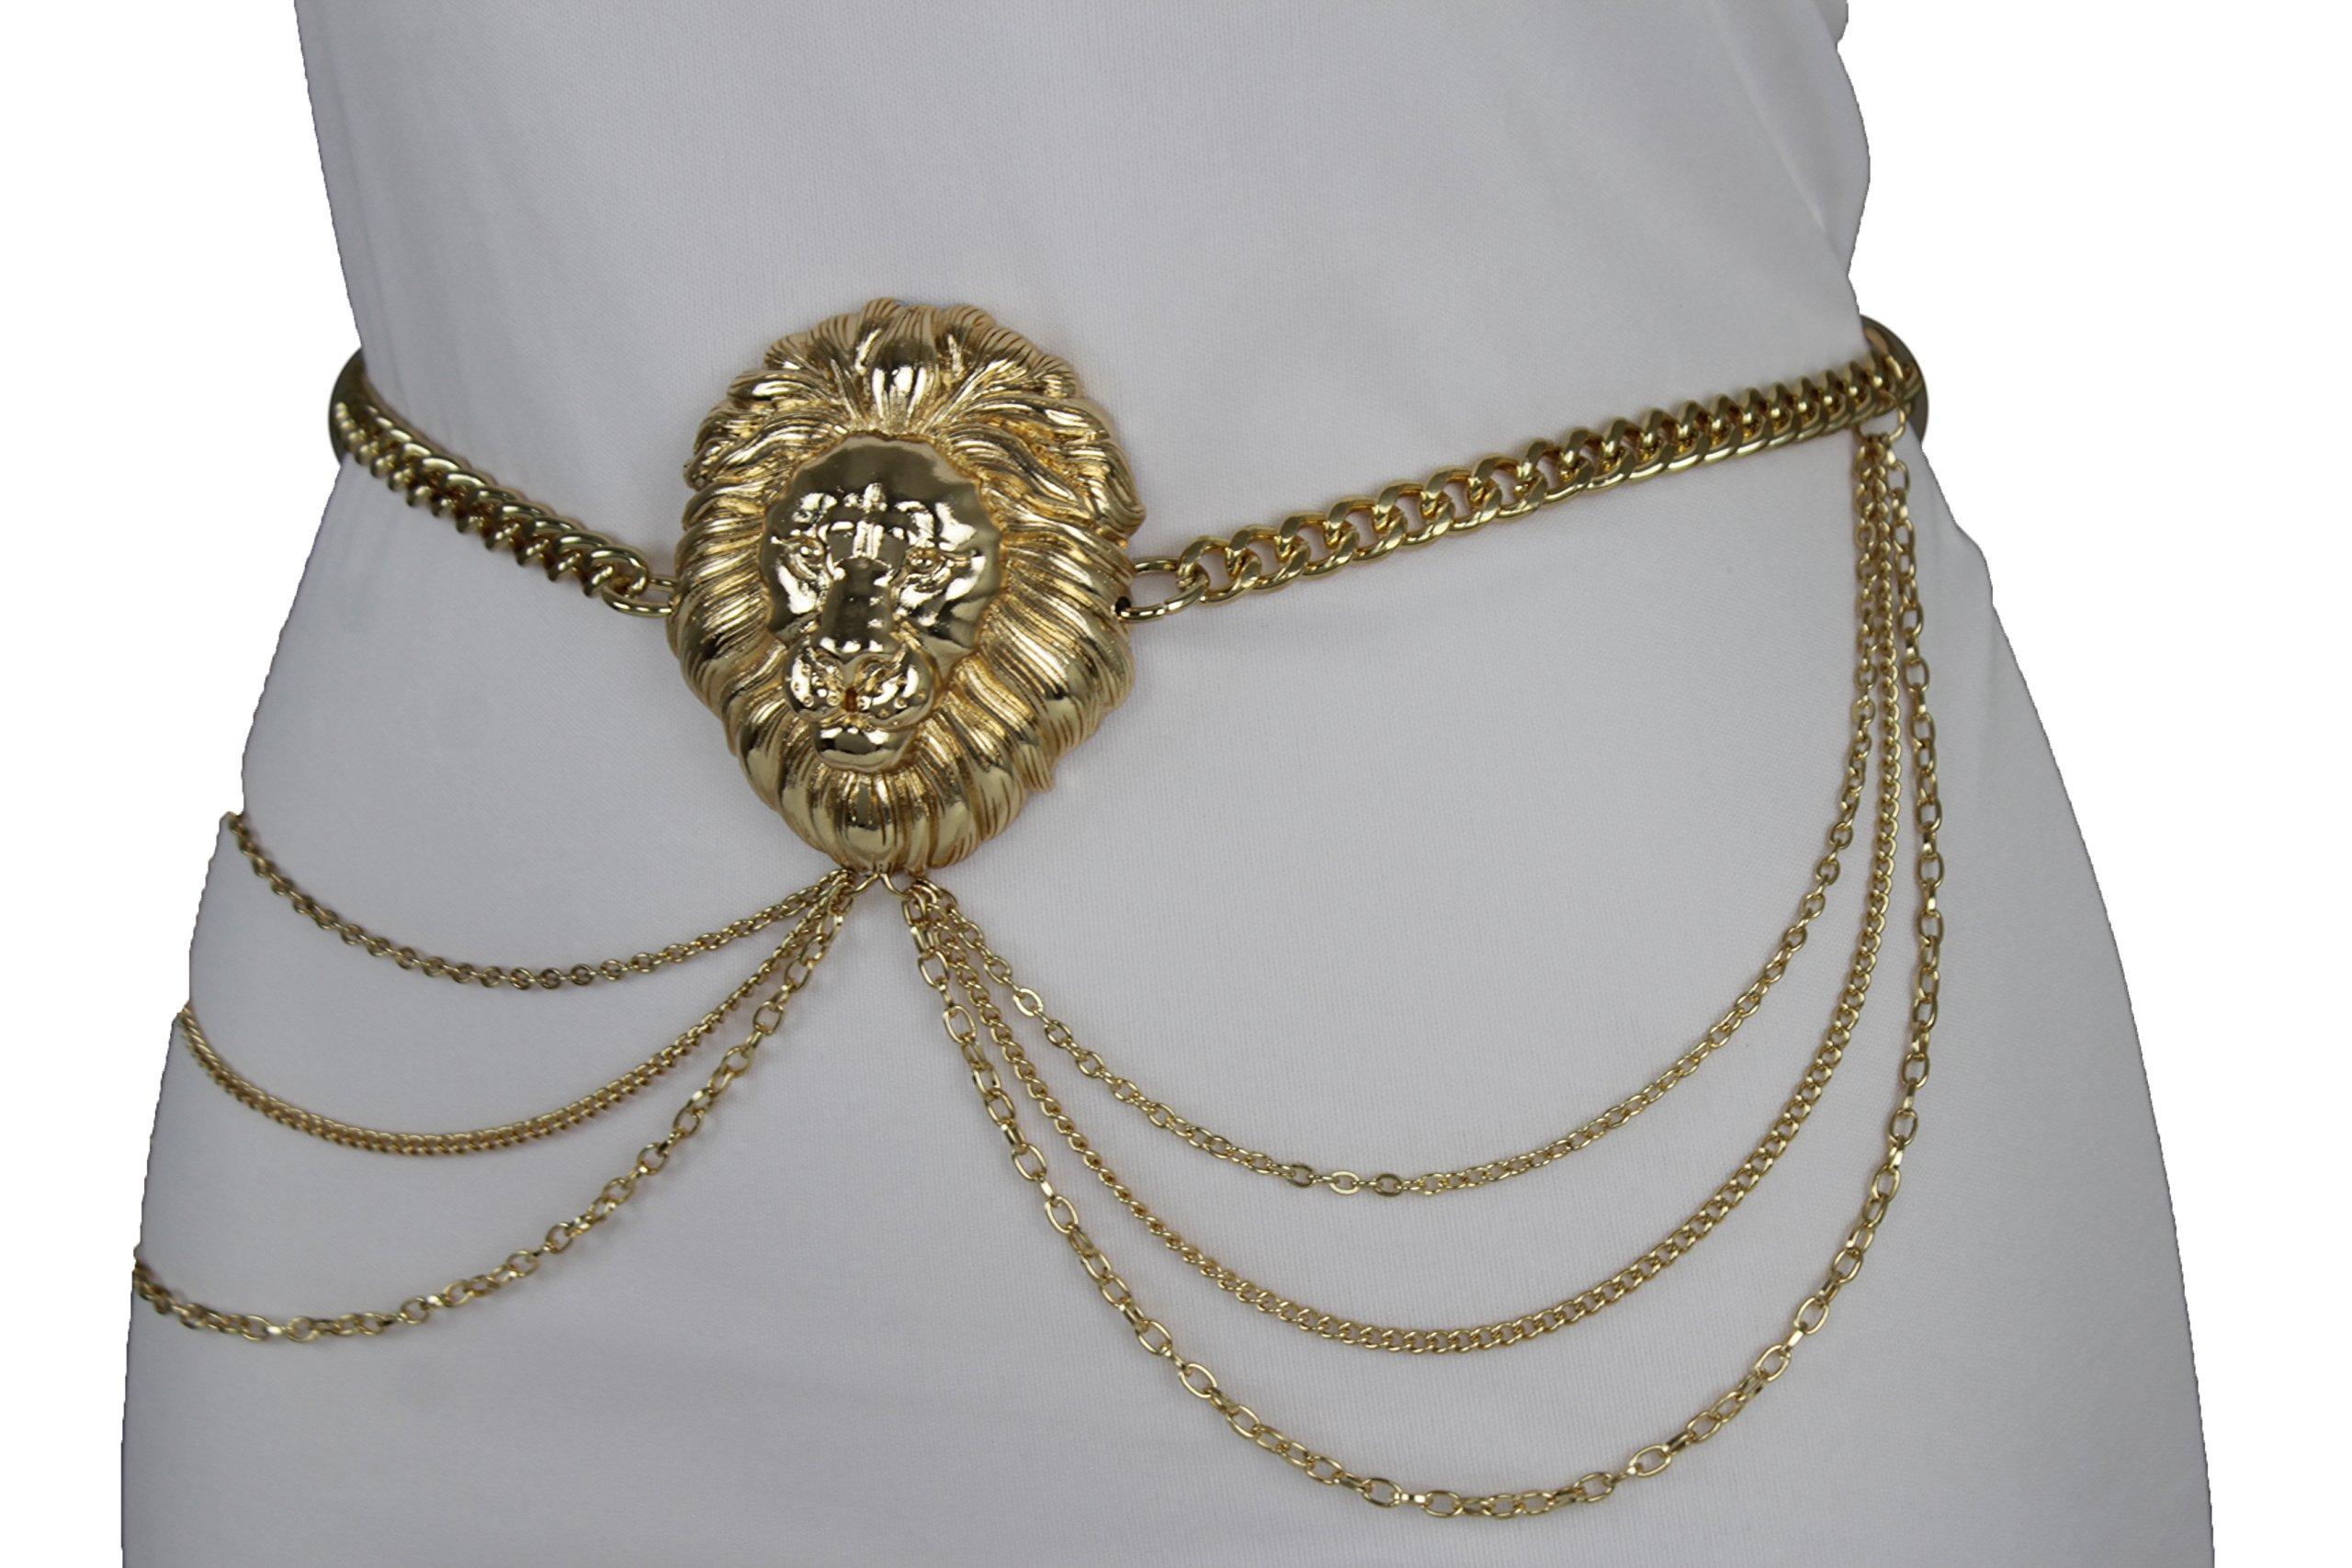 TFJ Women Fashion Belt Hip High Waist Gold Metal Chains Lion Buckle Charm Sexy (Medium - XL 30''-45'')